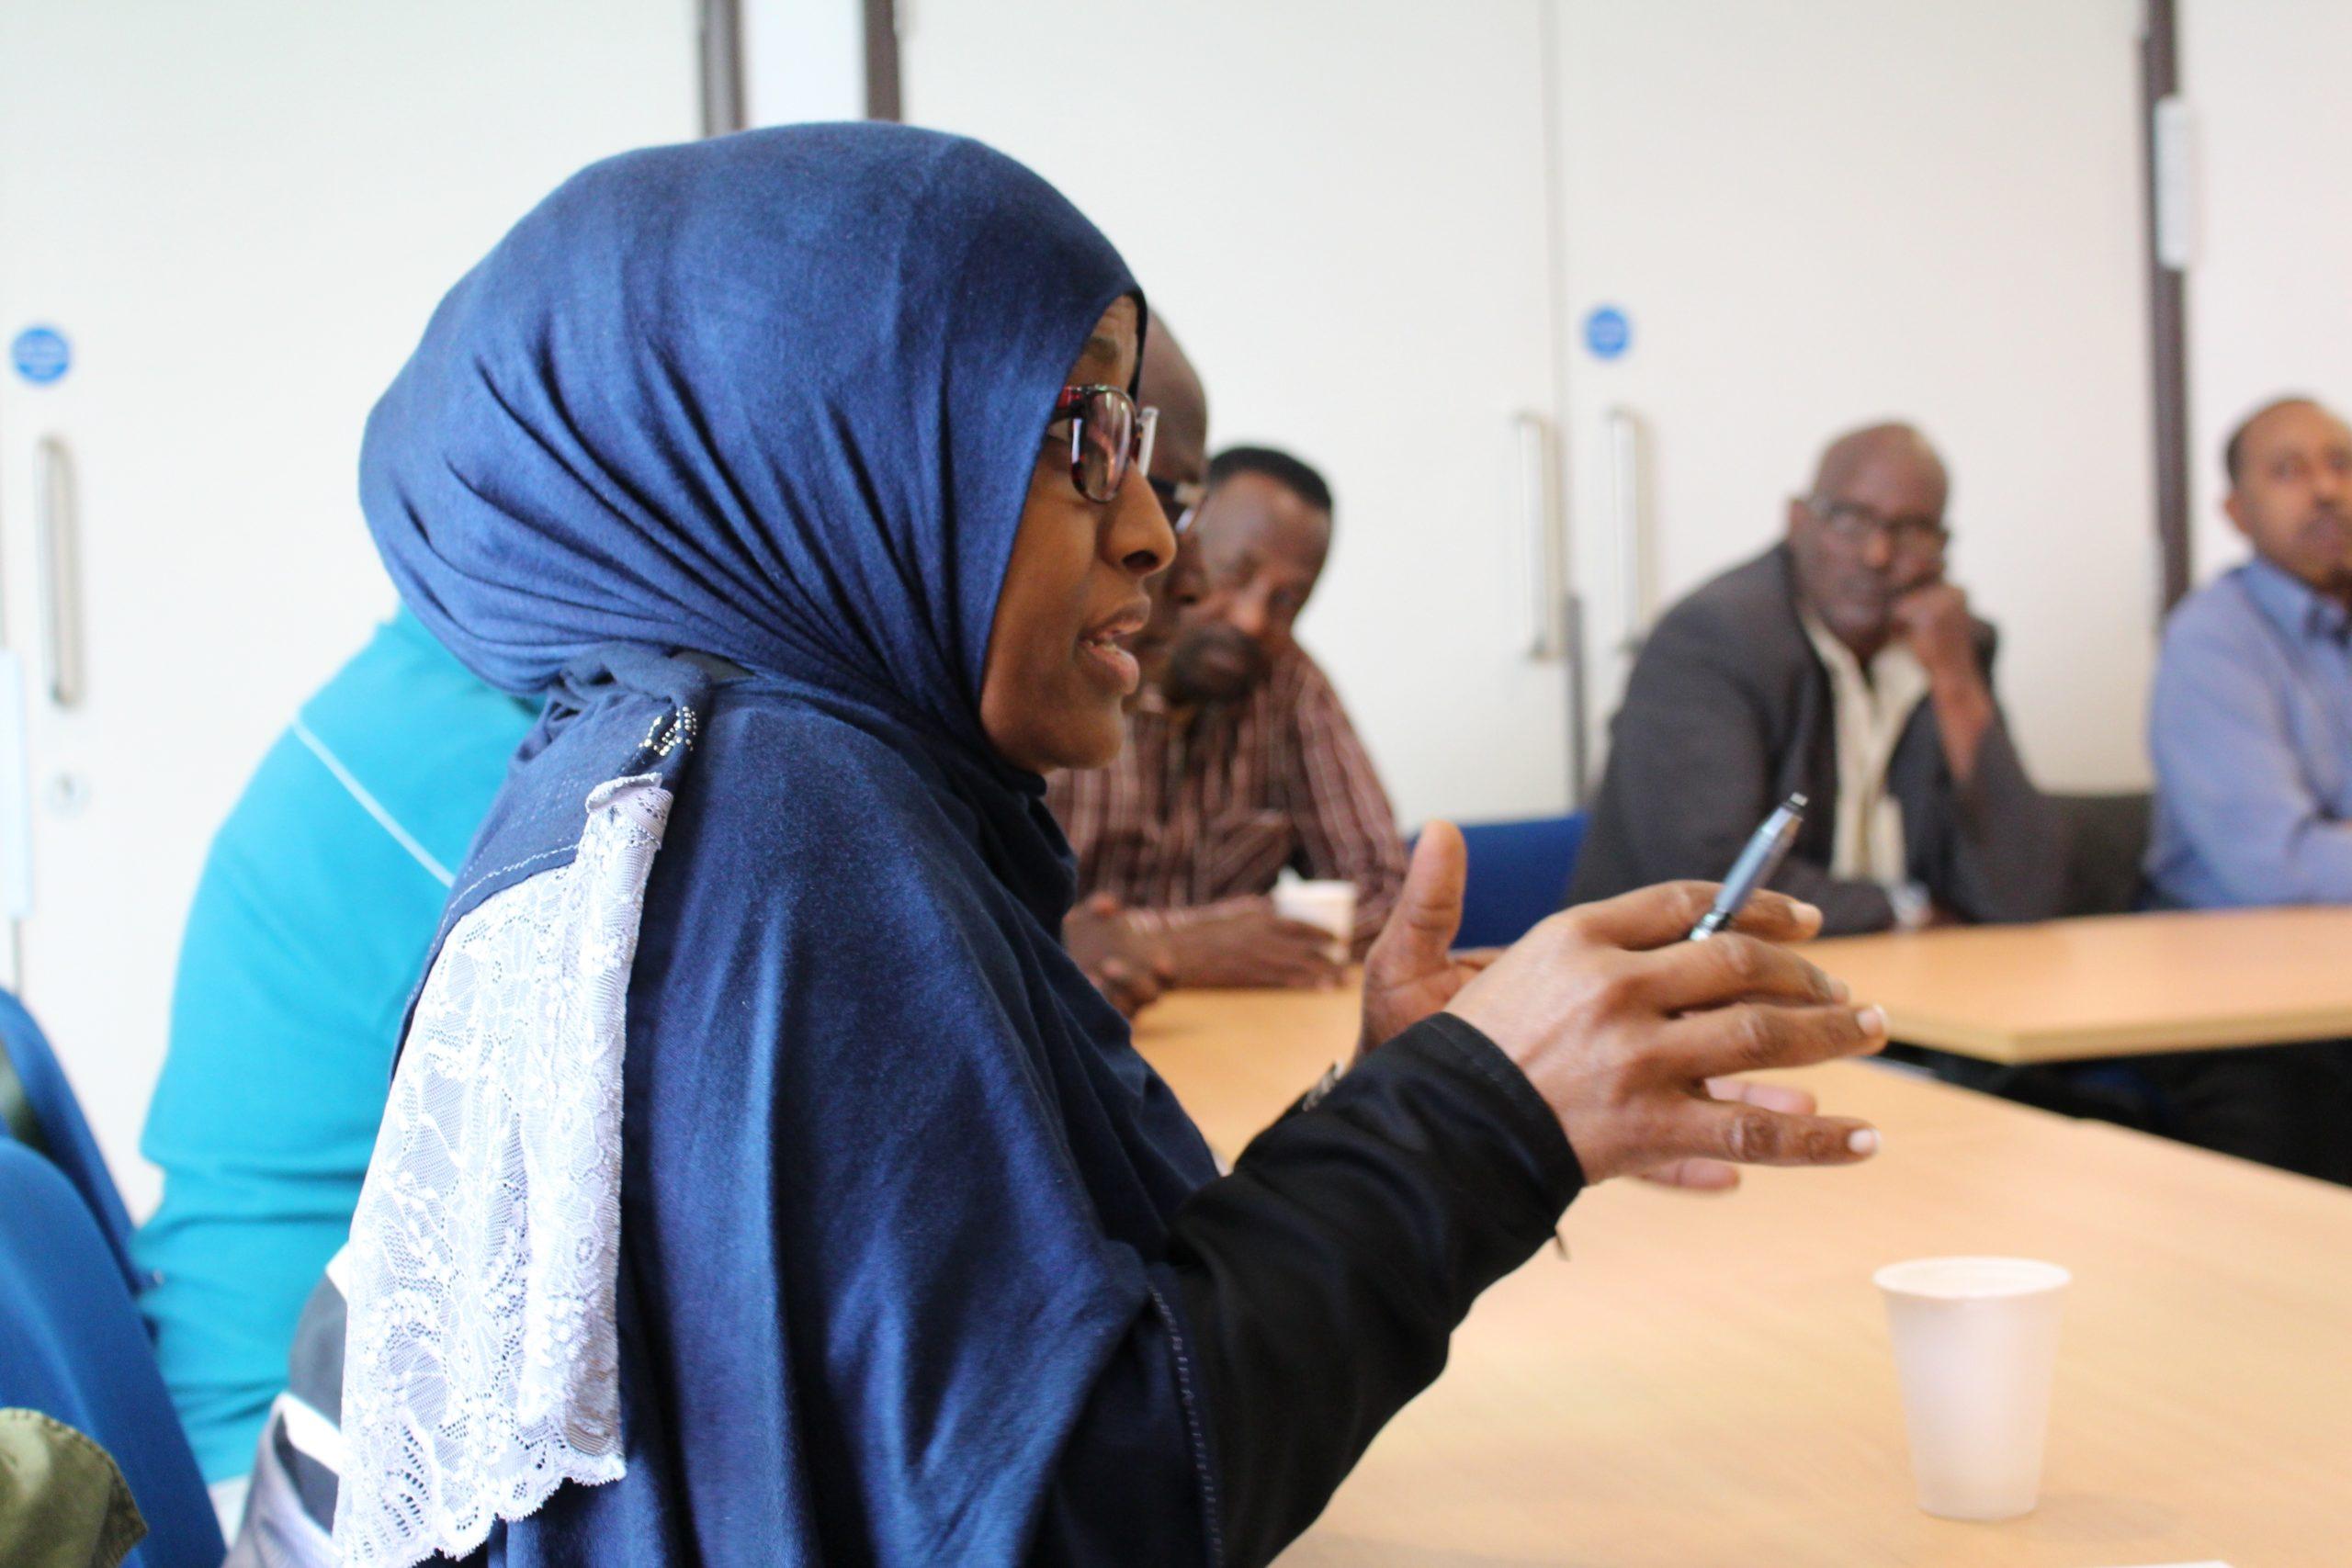 Sara Abdulahi: intergenerational issues are key